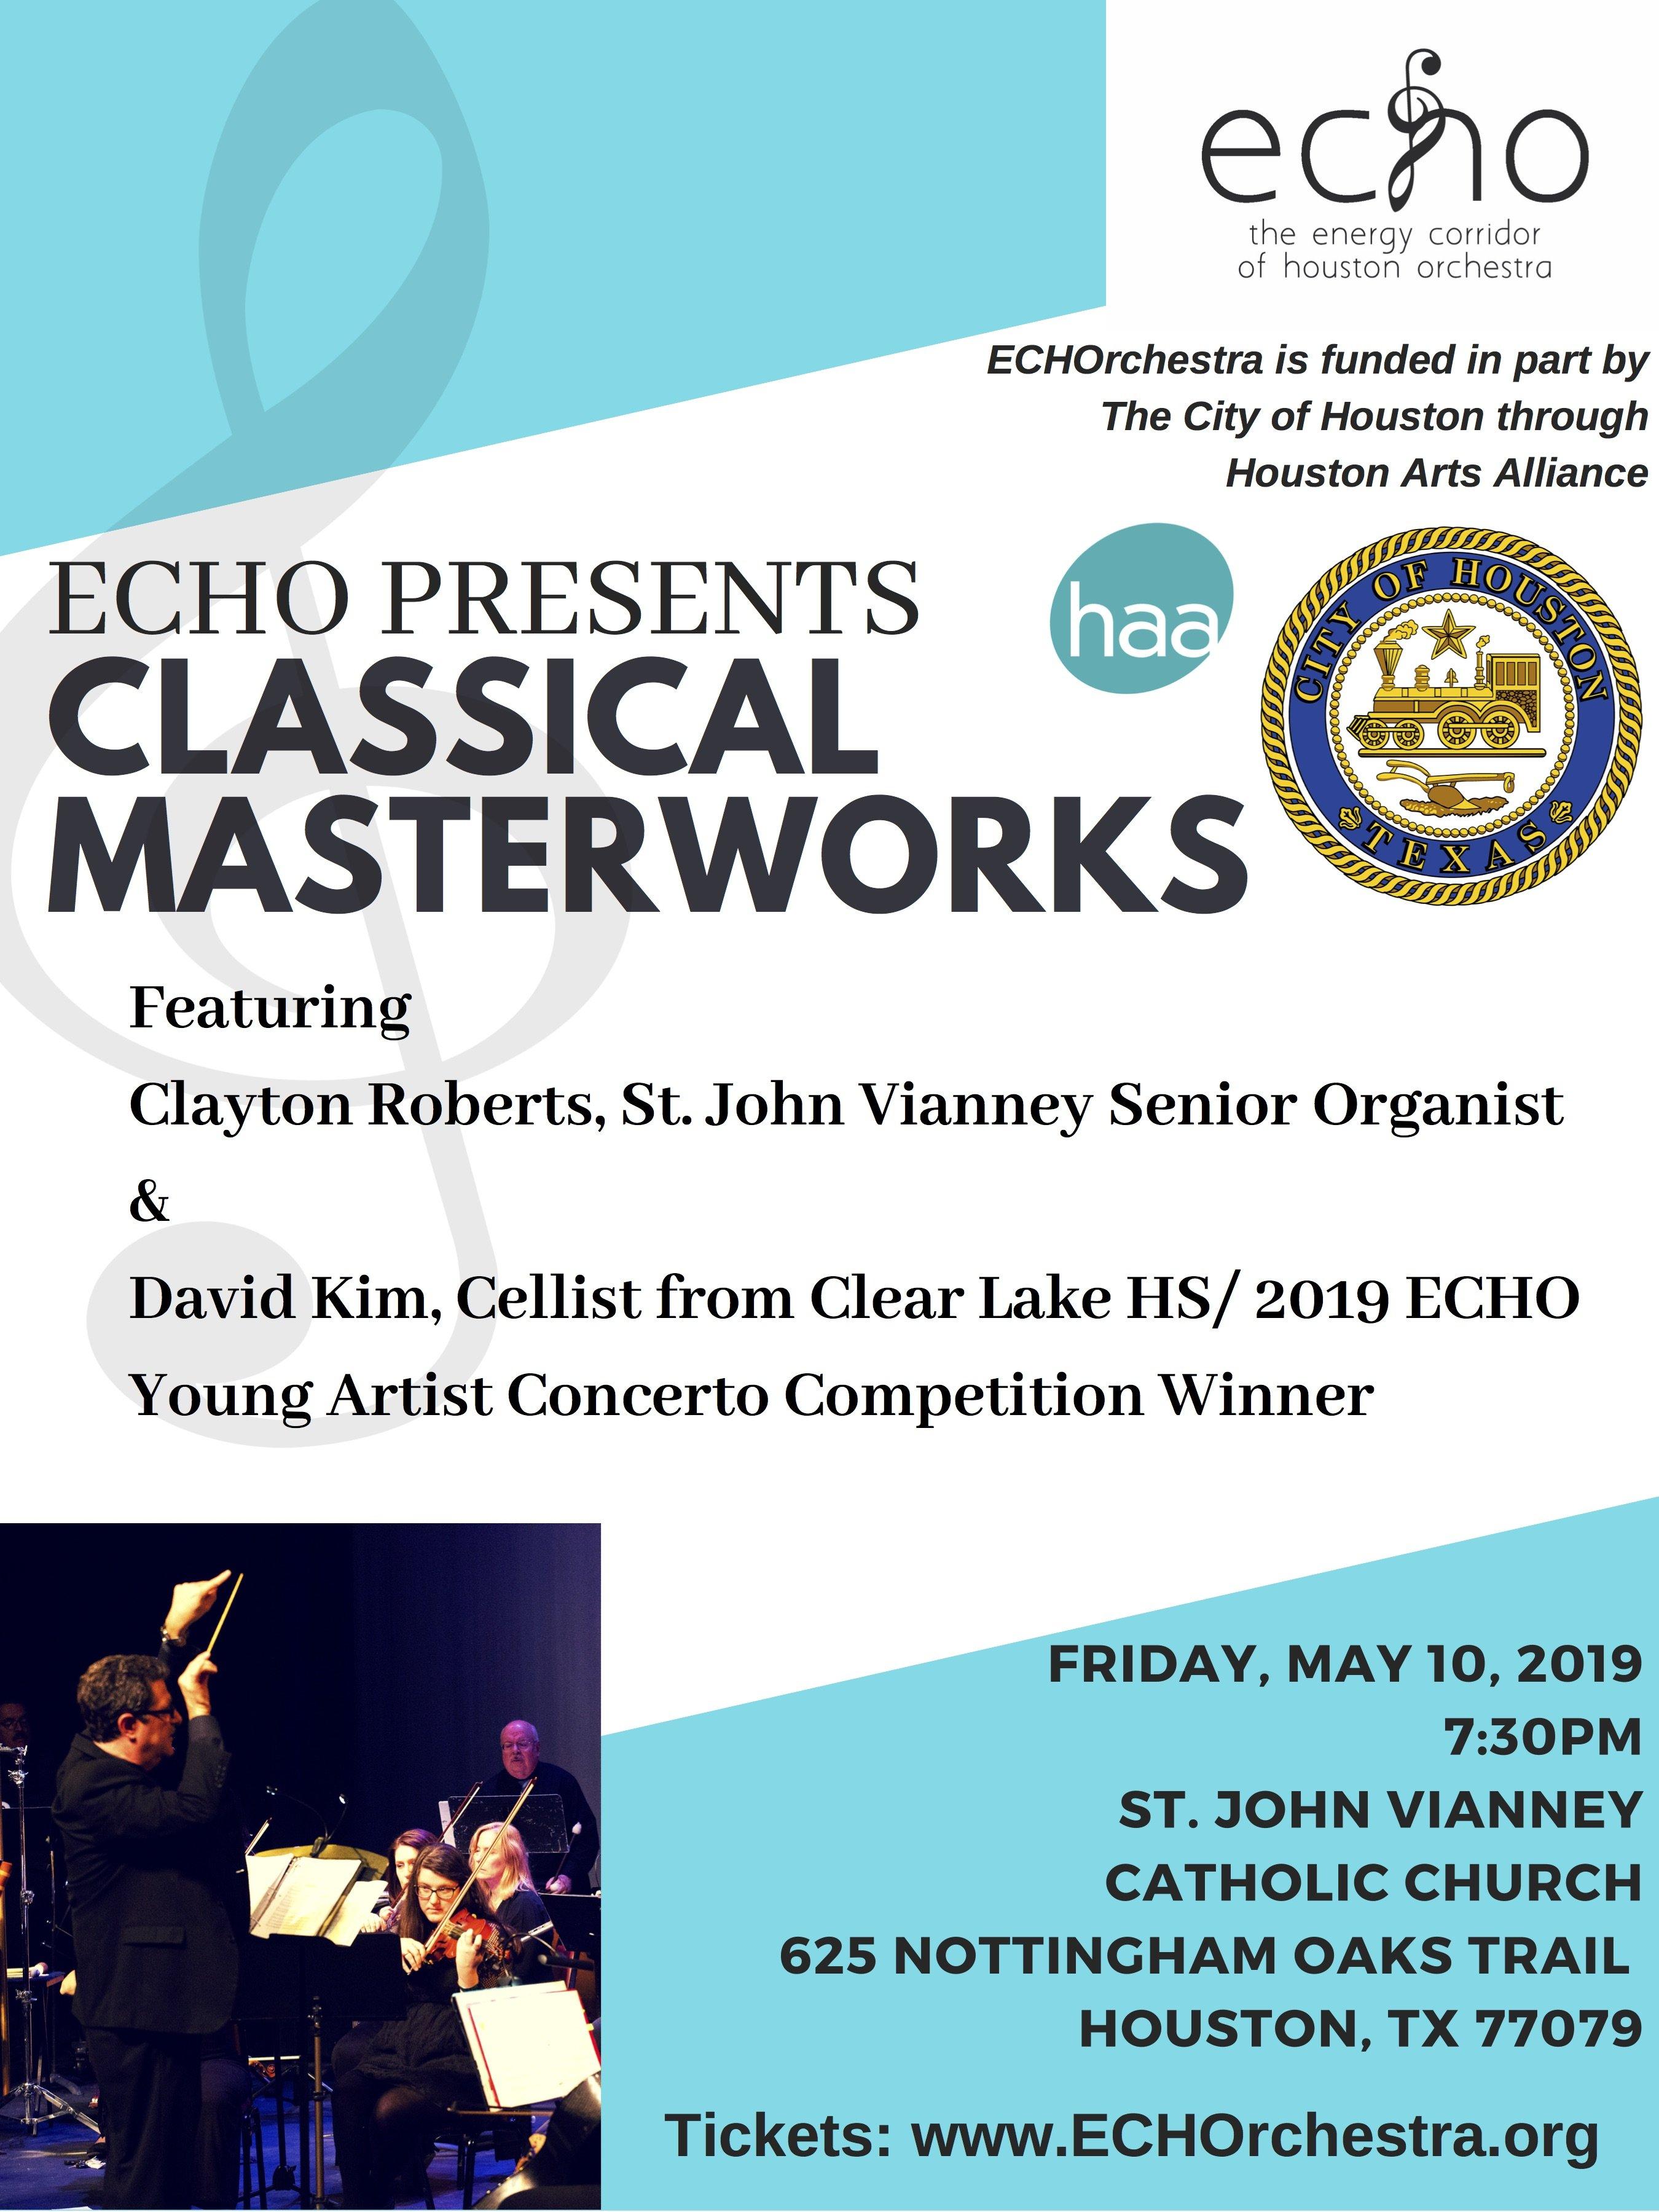 ECHO PRESENTS CLASSICAL MASTERWORKS